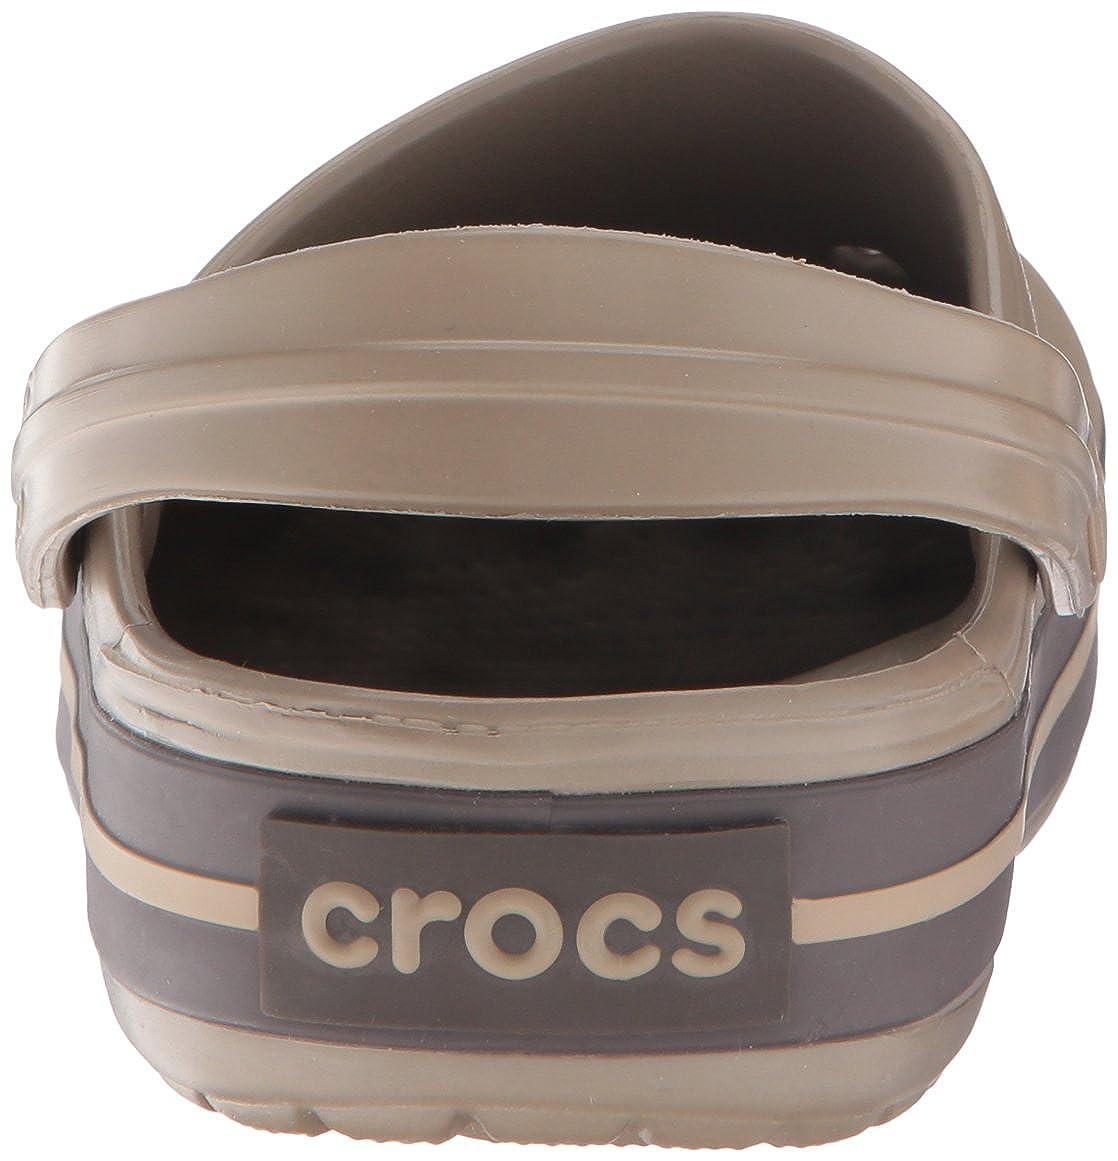 Crocs Unisex-Erwachsene Crocband Crocband Unisex-Erwachsene Clogs Braun (Khaki/Espresso) 5bc8c7